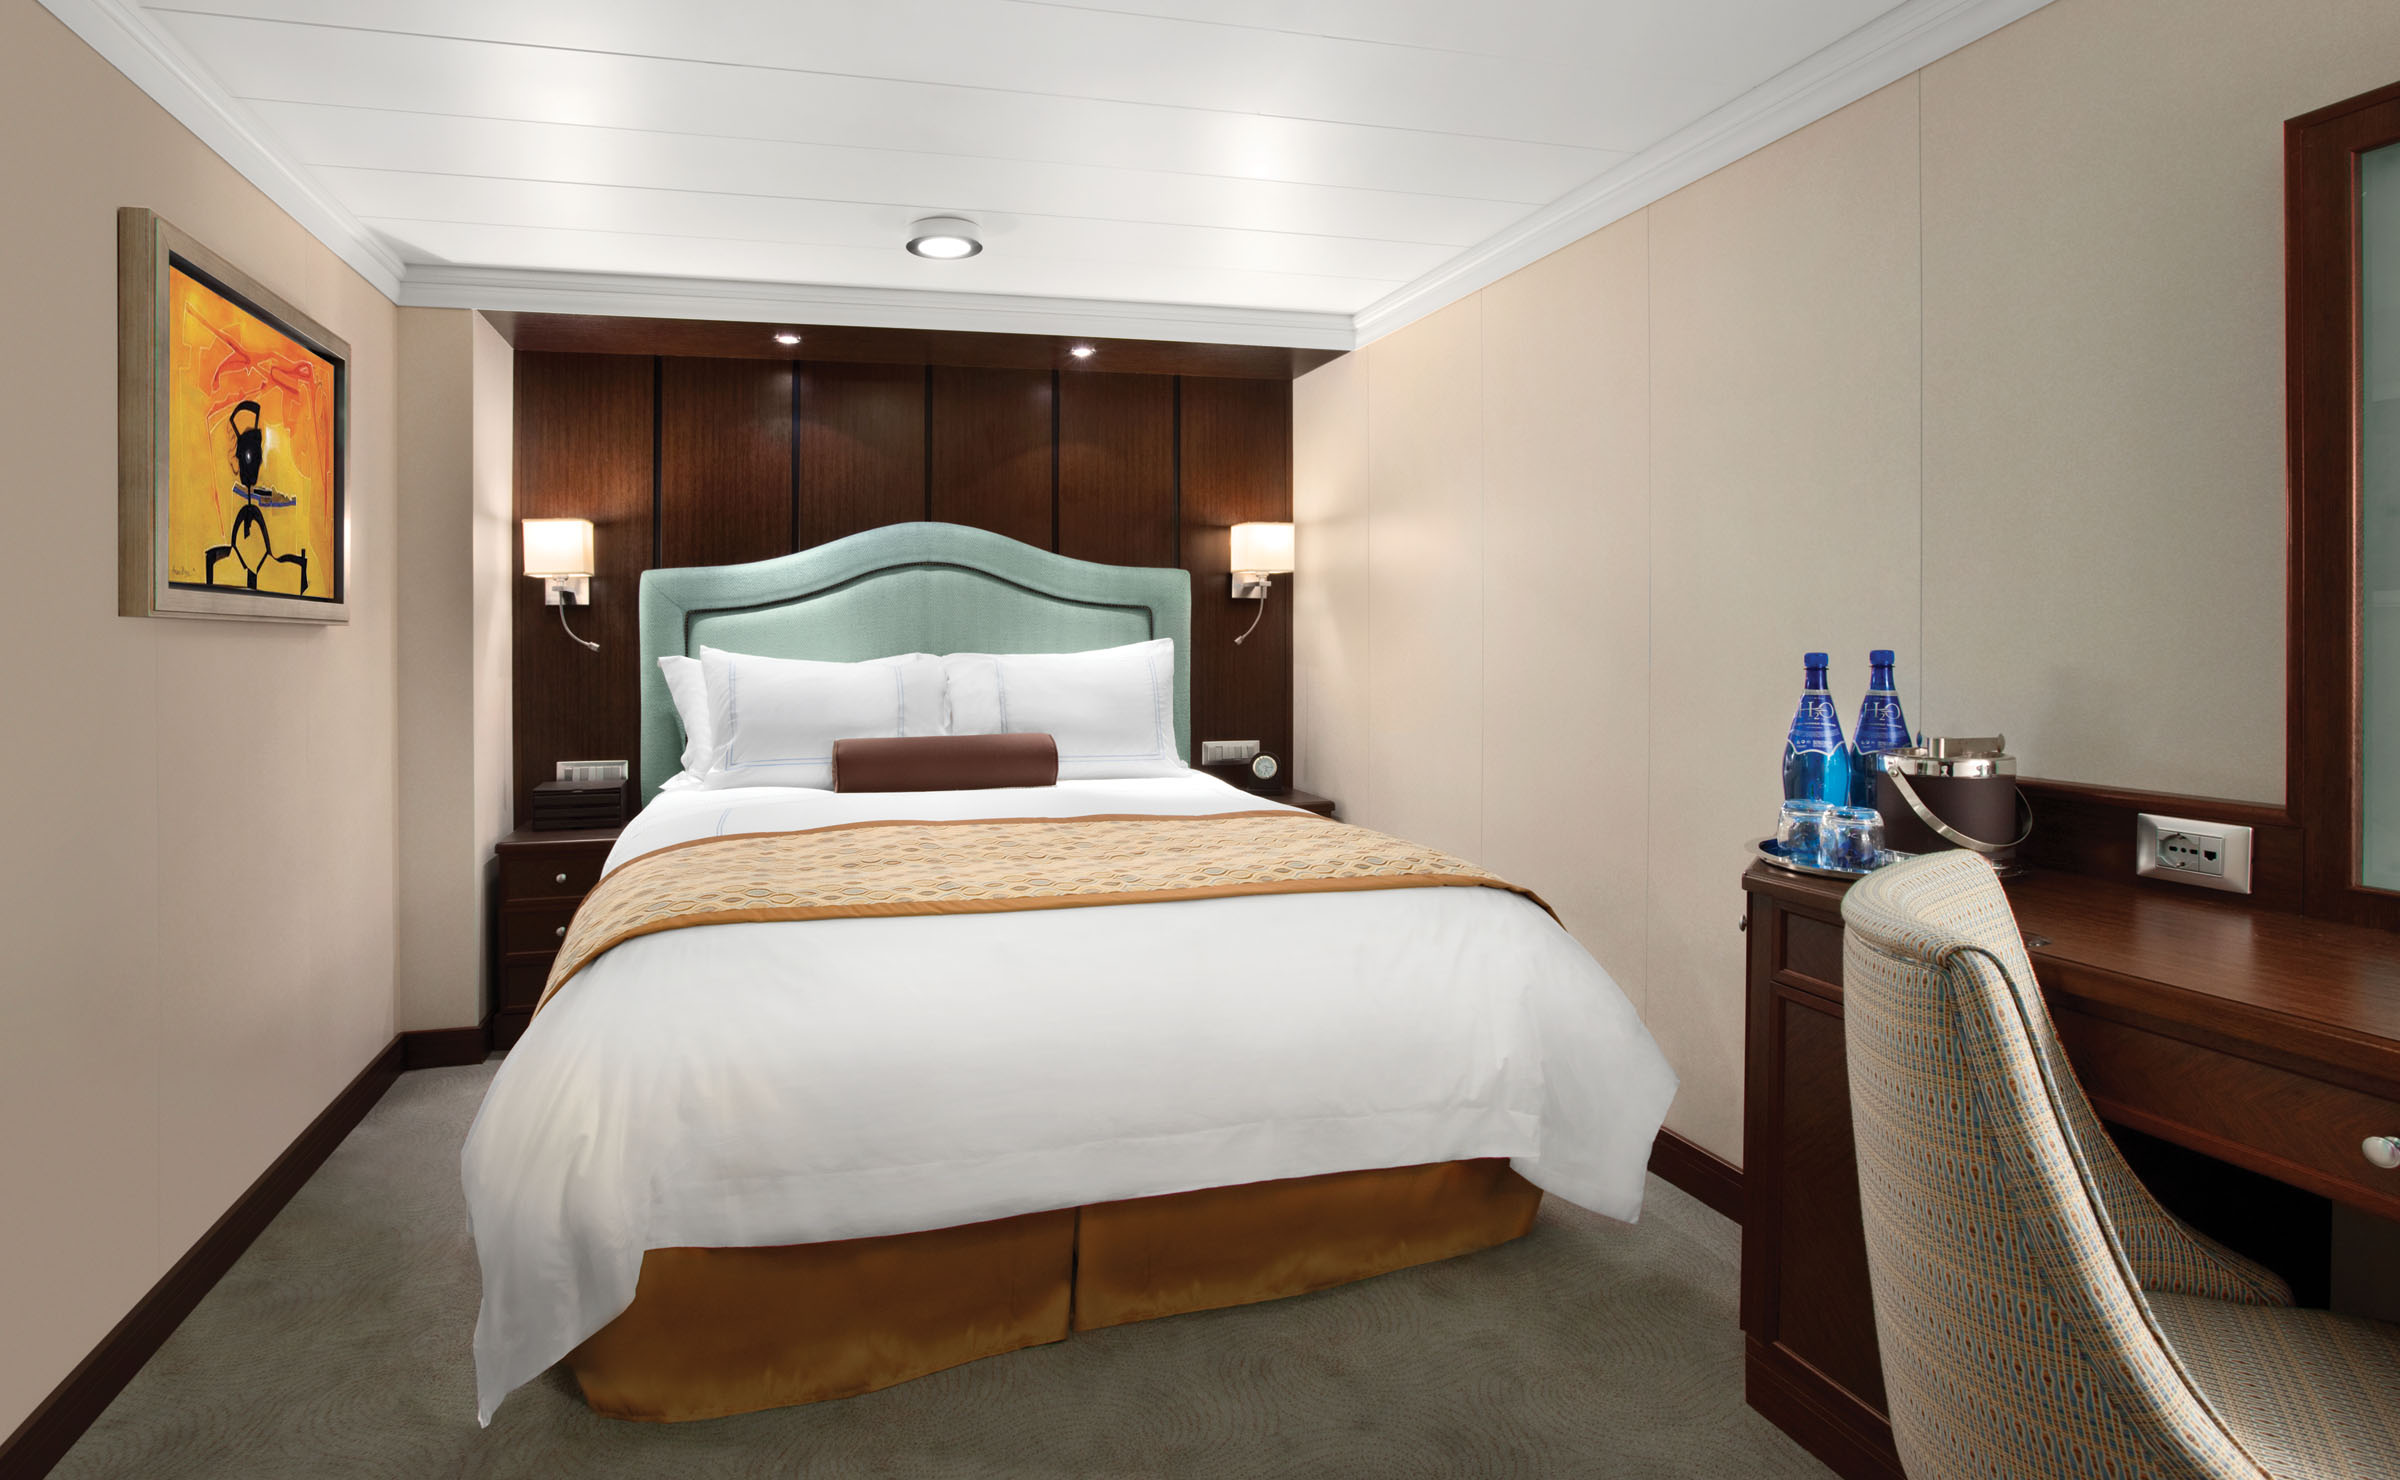 Oceania Cruises Oceania Class Accommodation Inside Stateroom.jpg